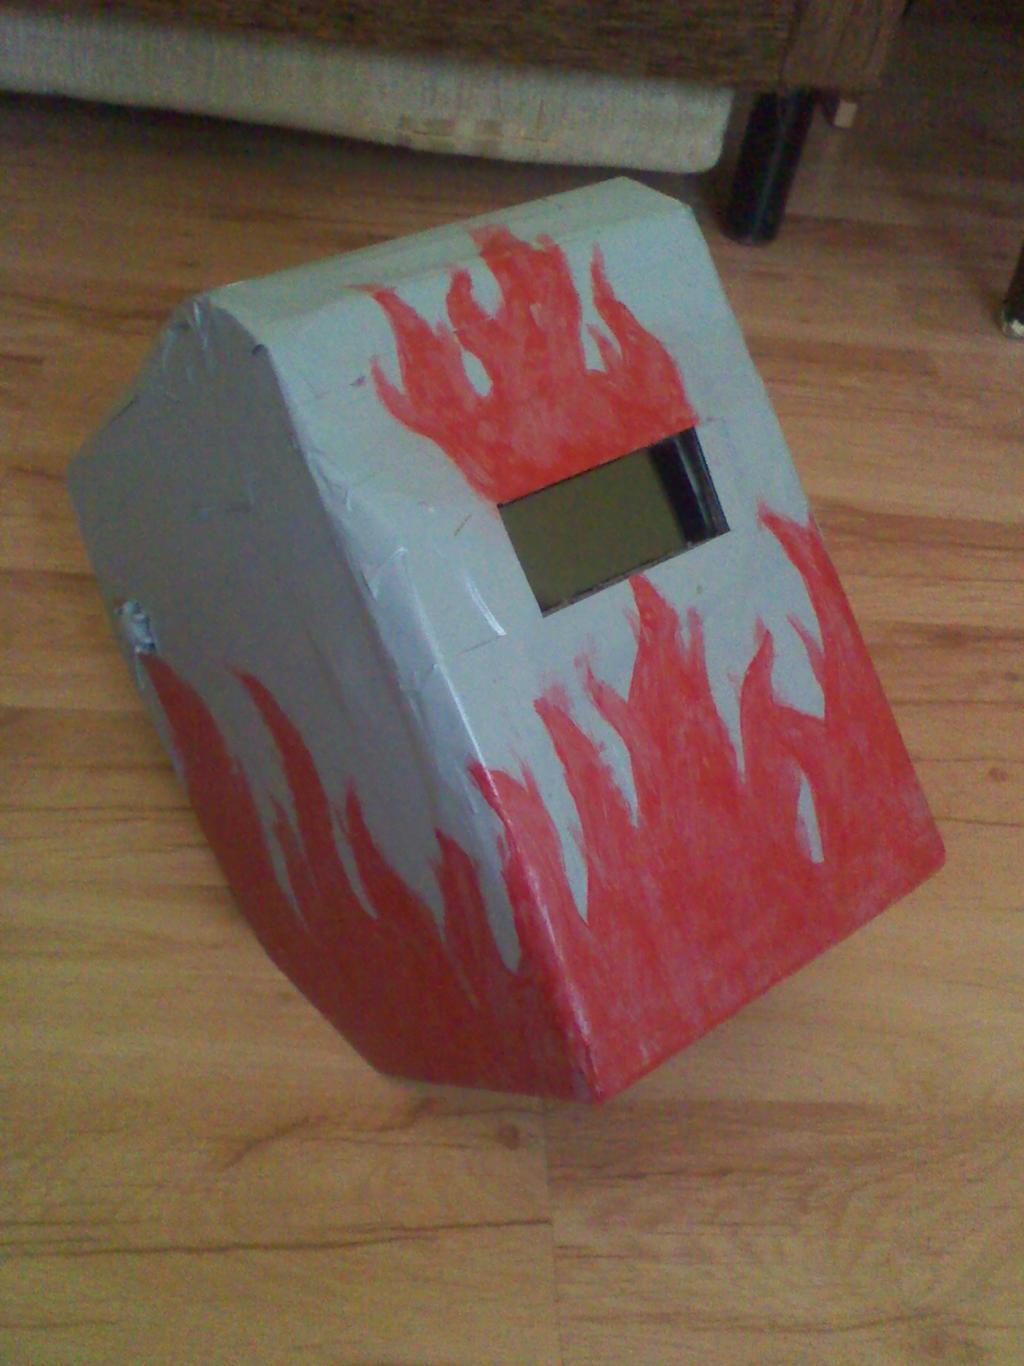 Engineer Hotrod from Team Fortress 2 by SzatanskiLisek